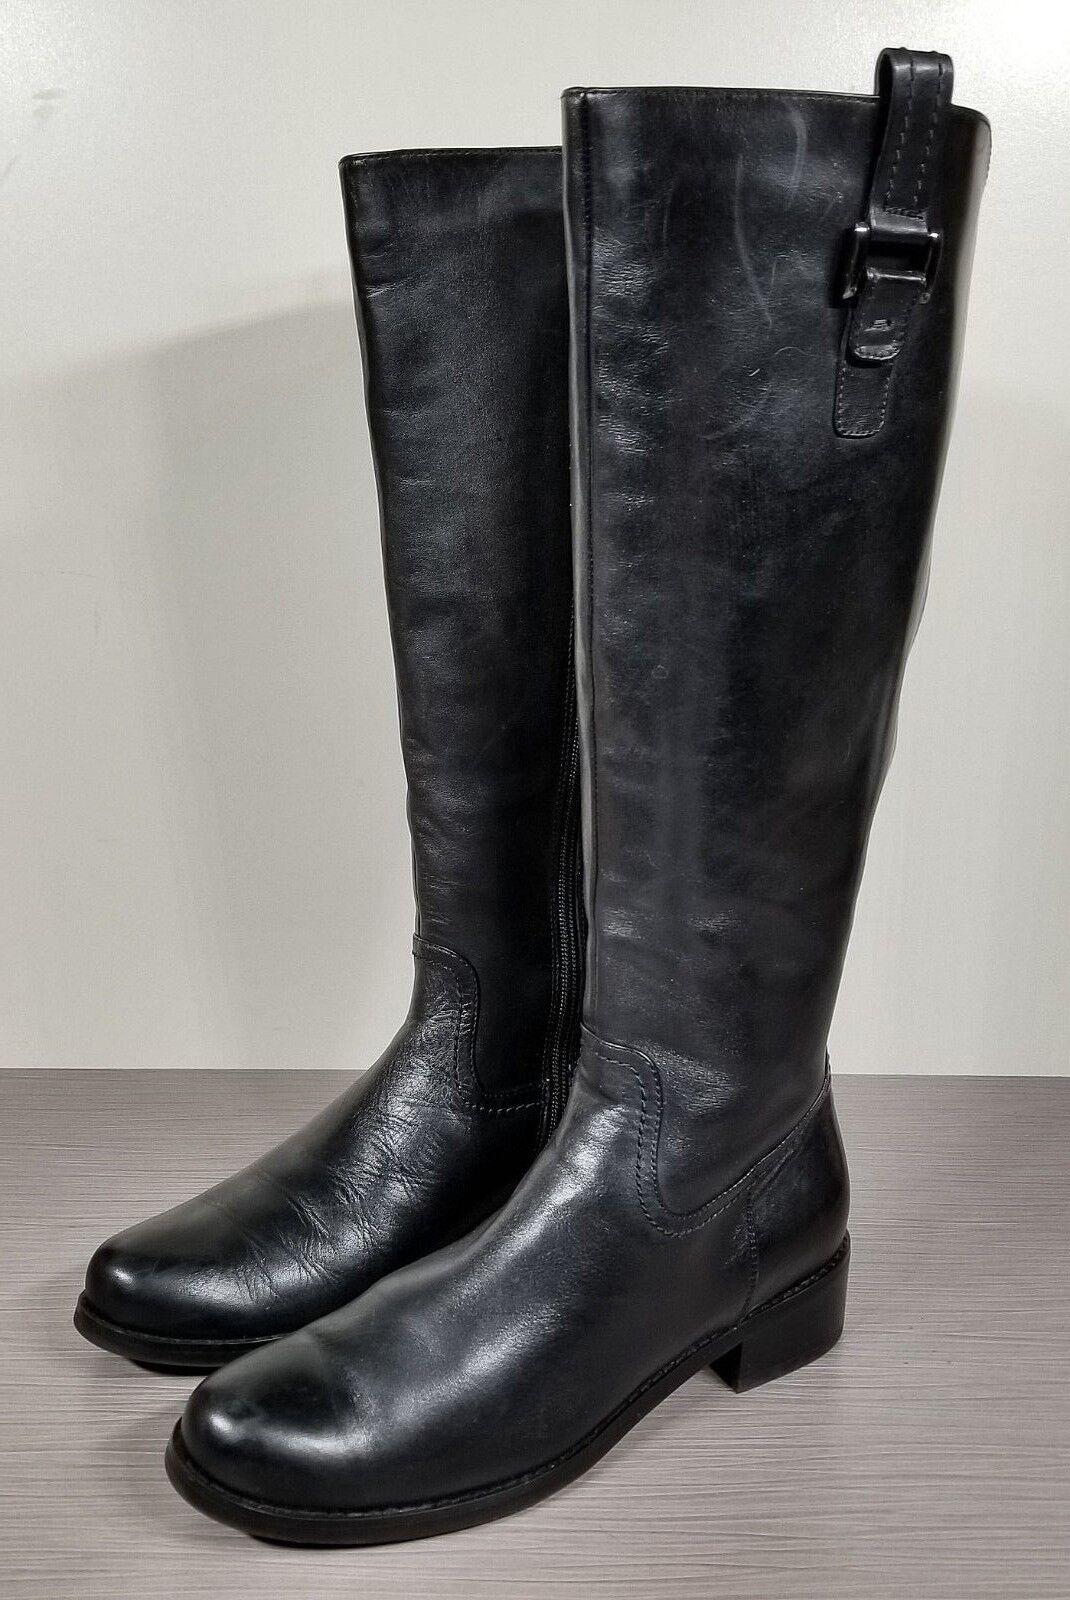 Blondo Black Leather 'Velvet' Waterproof Riding Boot, Womens Size 8 8 8 M 90cd70